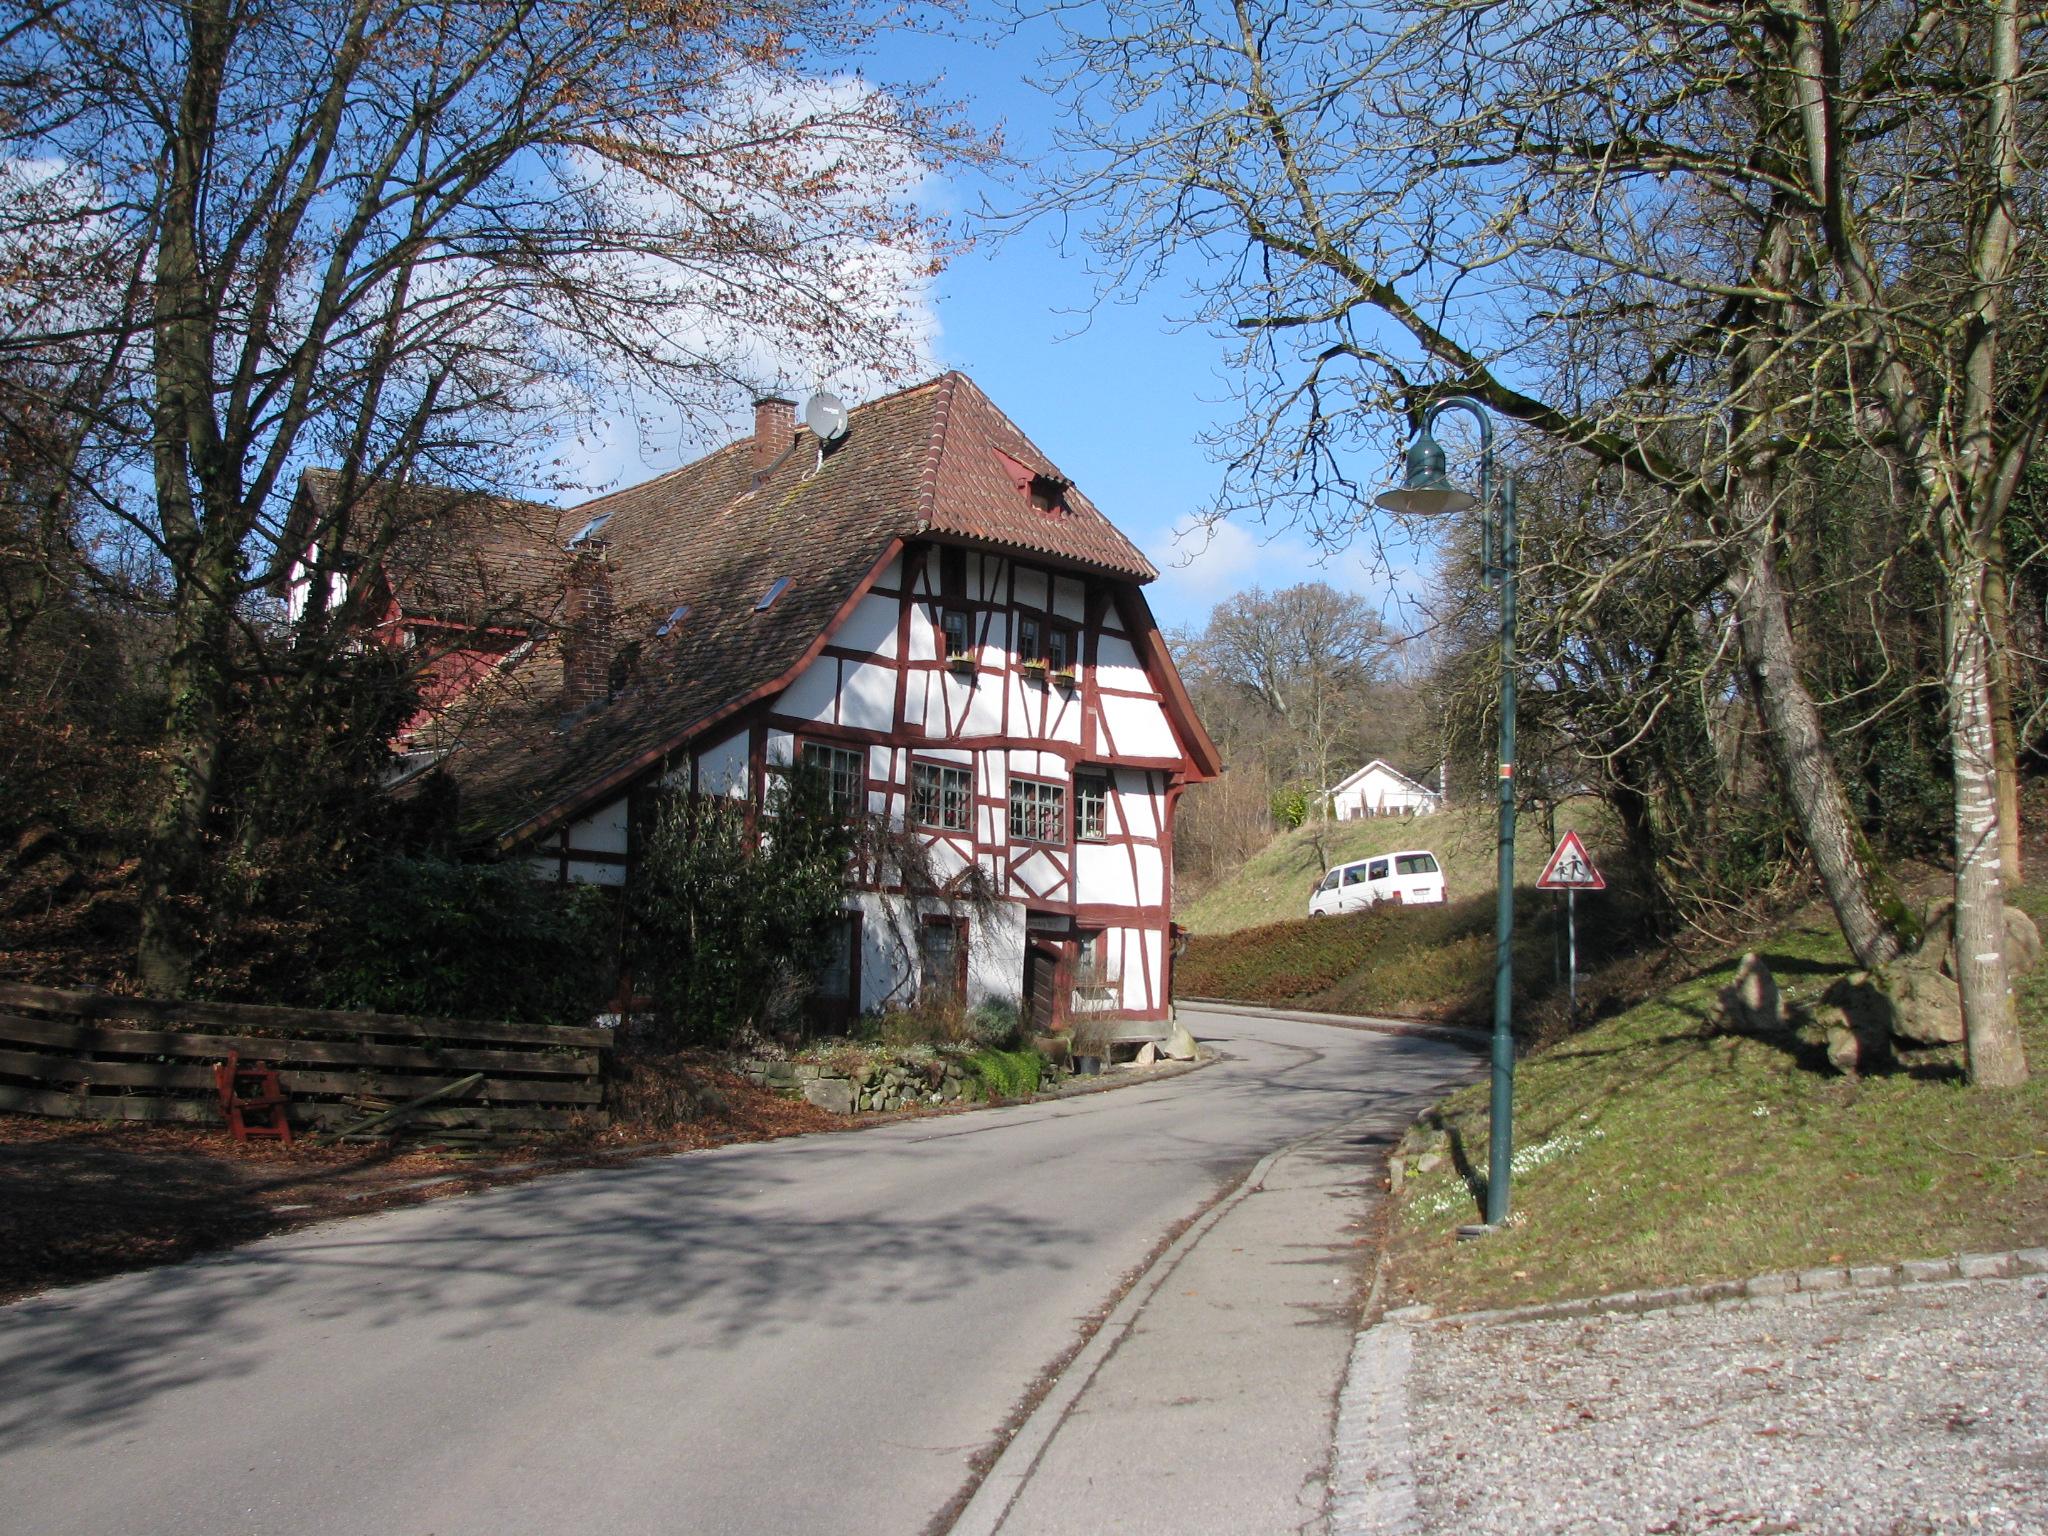 Töpferhaus